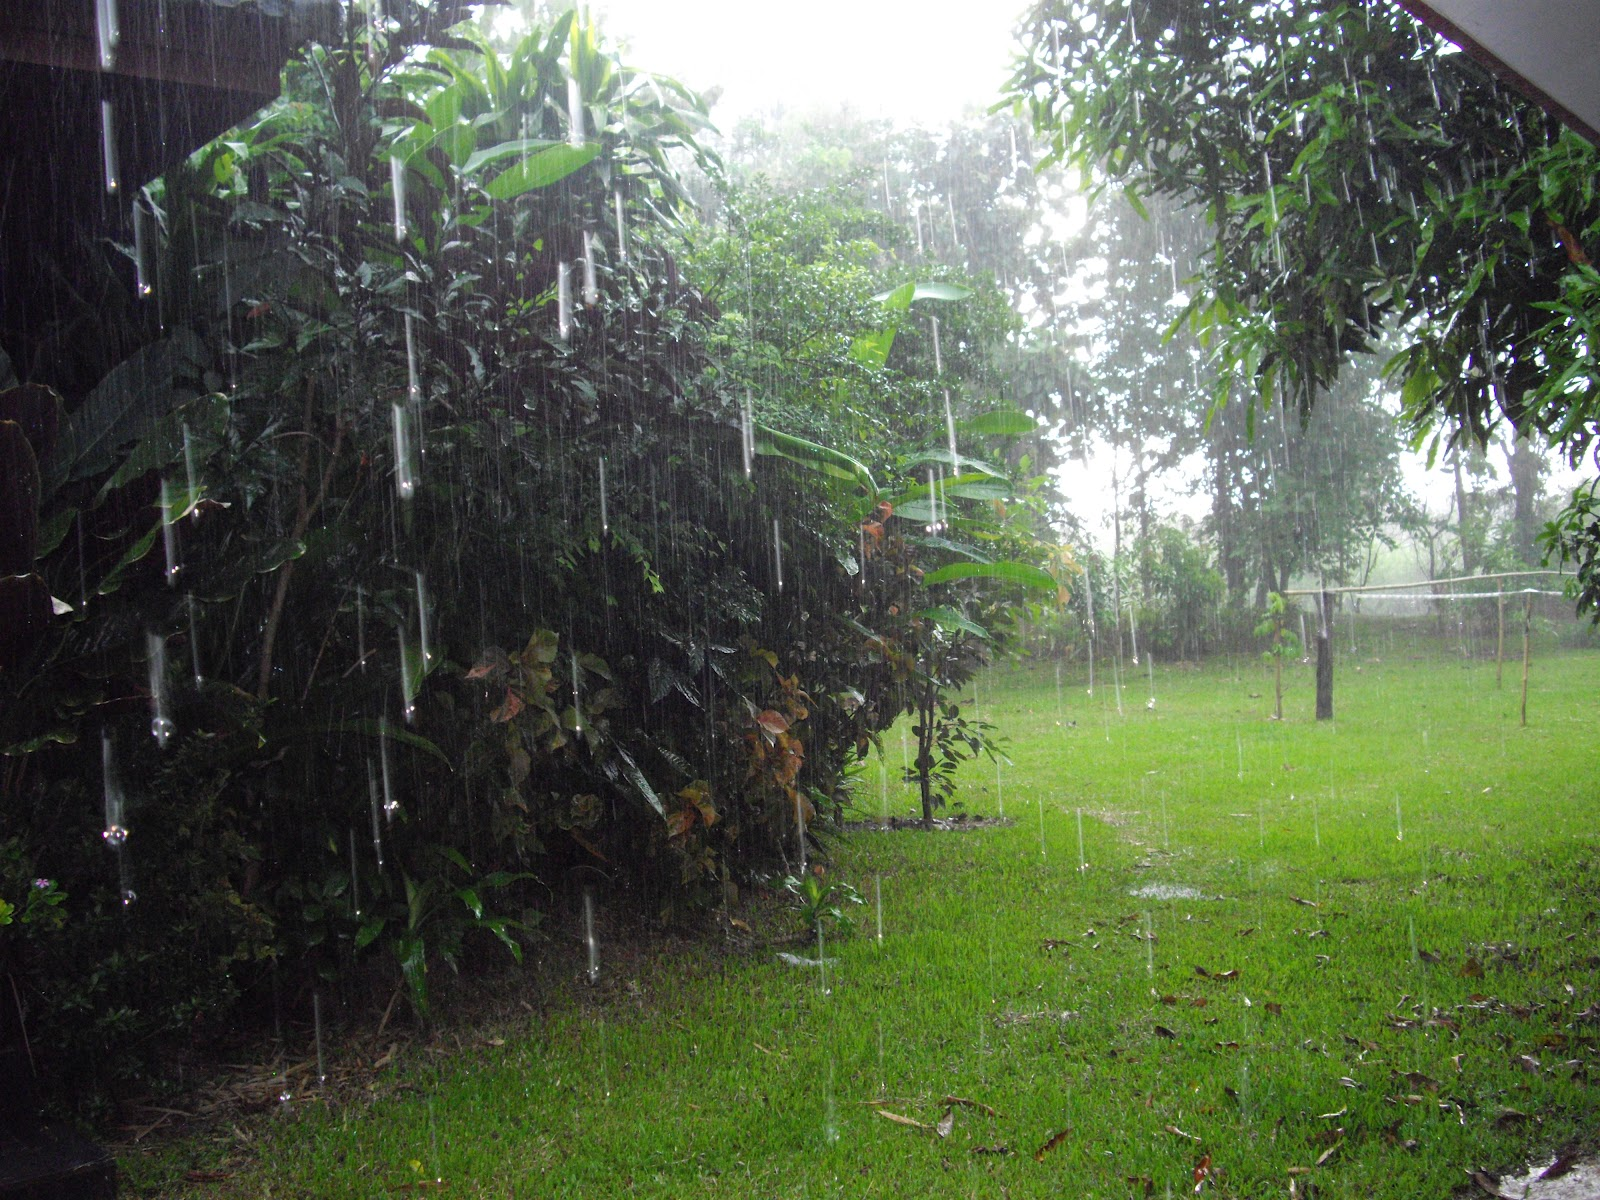 Jane's Journal: The Rainy Season In Thailand